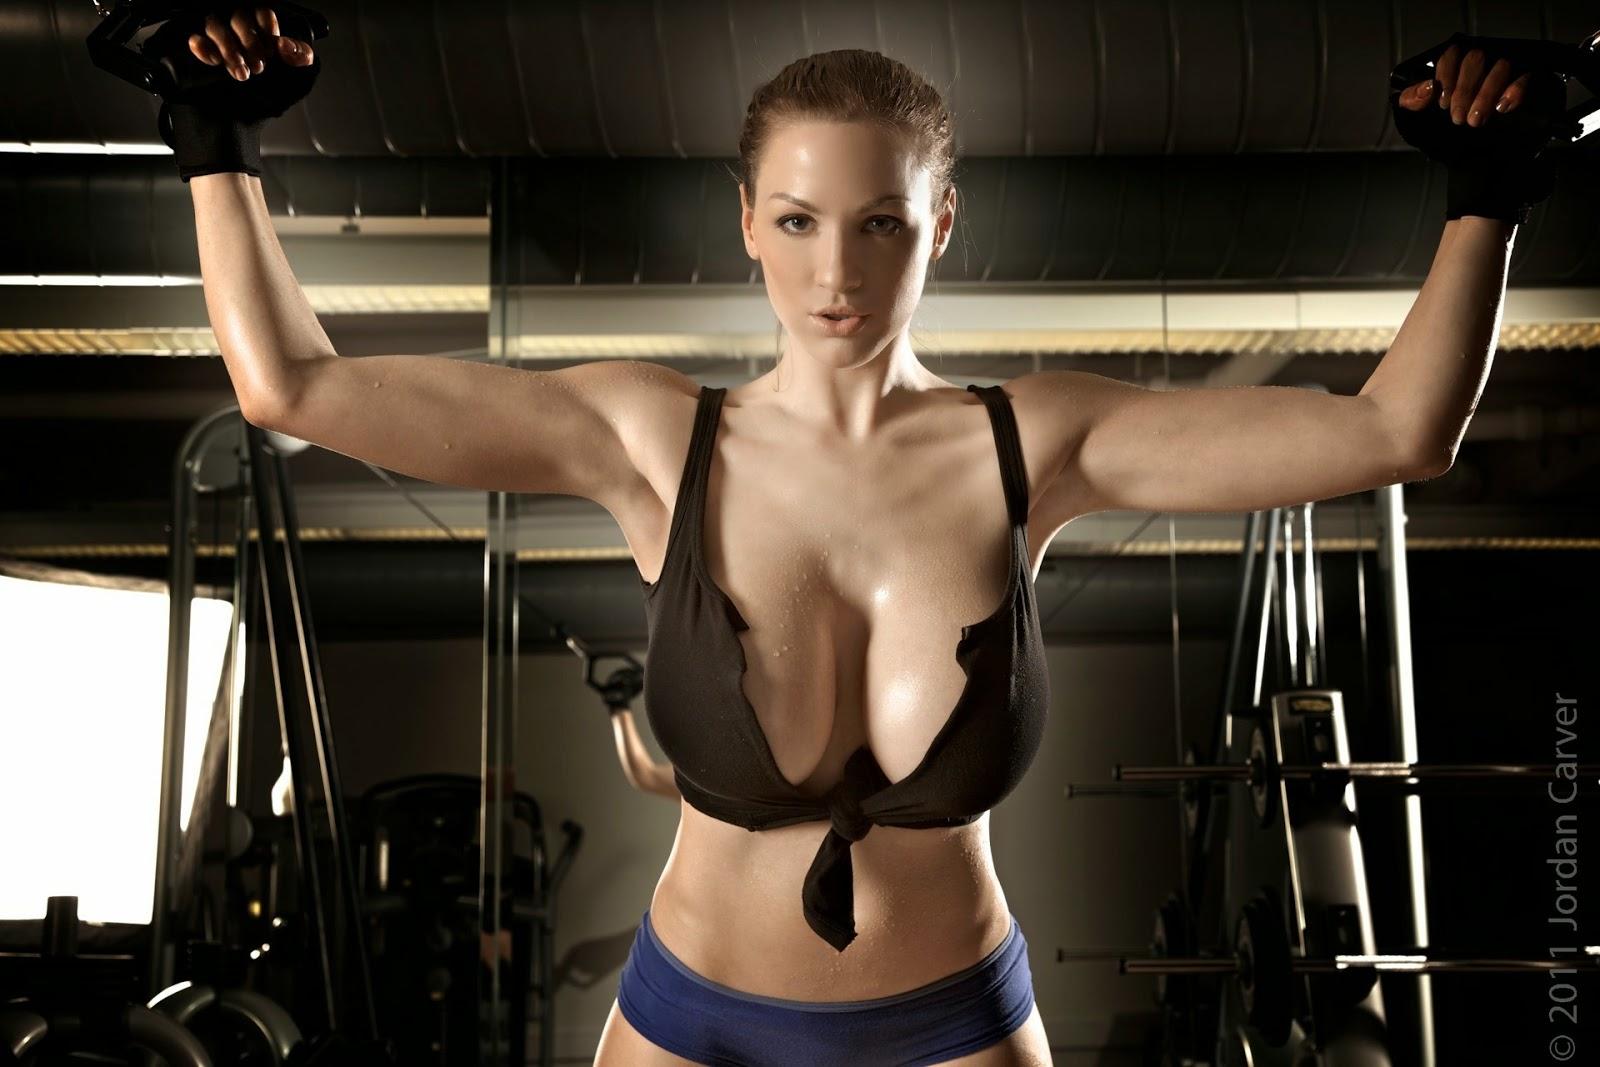 Сисястые спортсменки в спортзале — pic 2